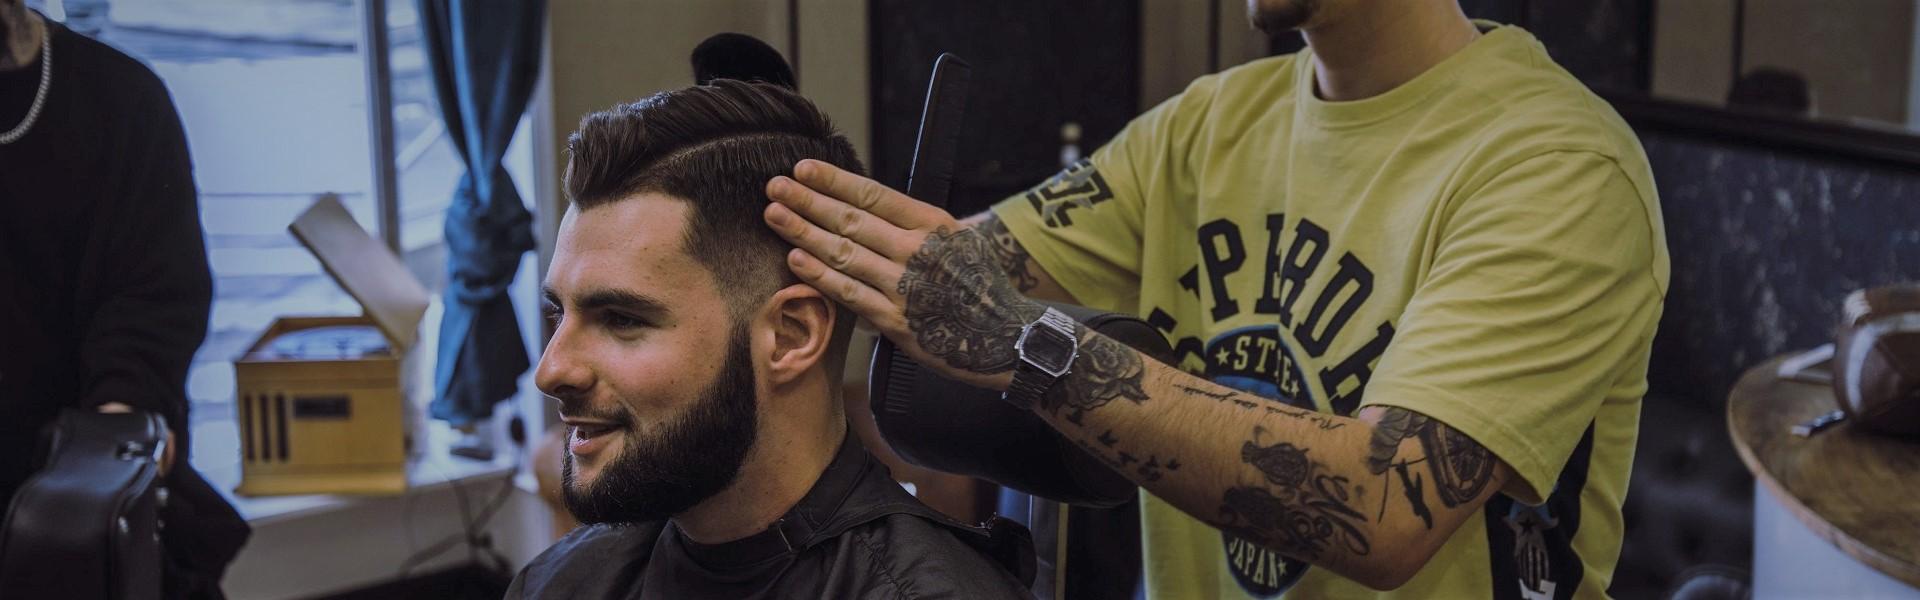 Salon de coiffure à Caen